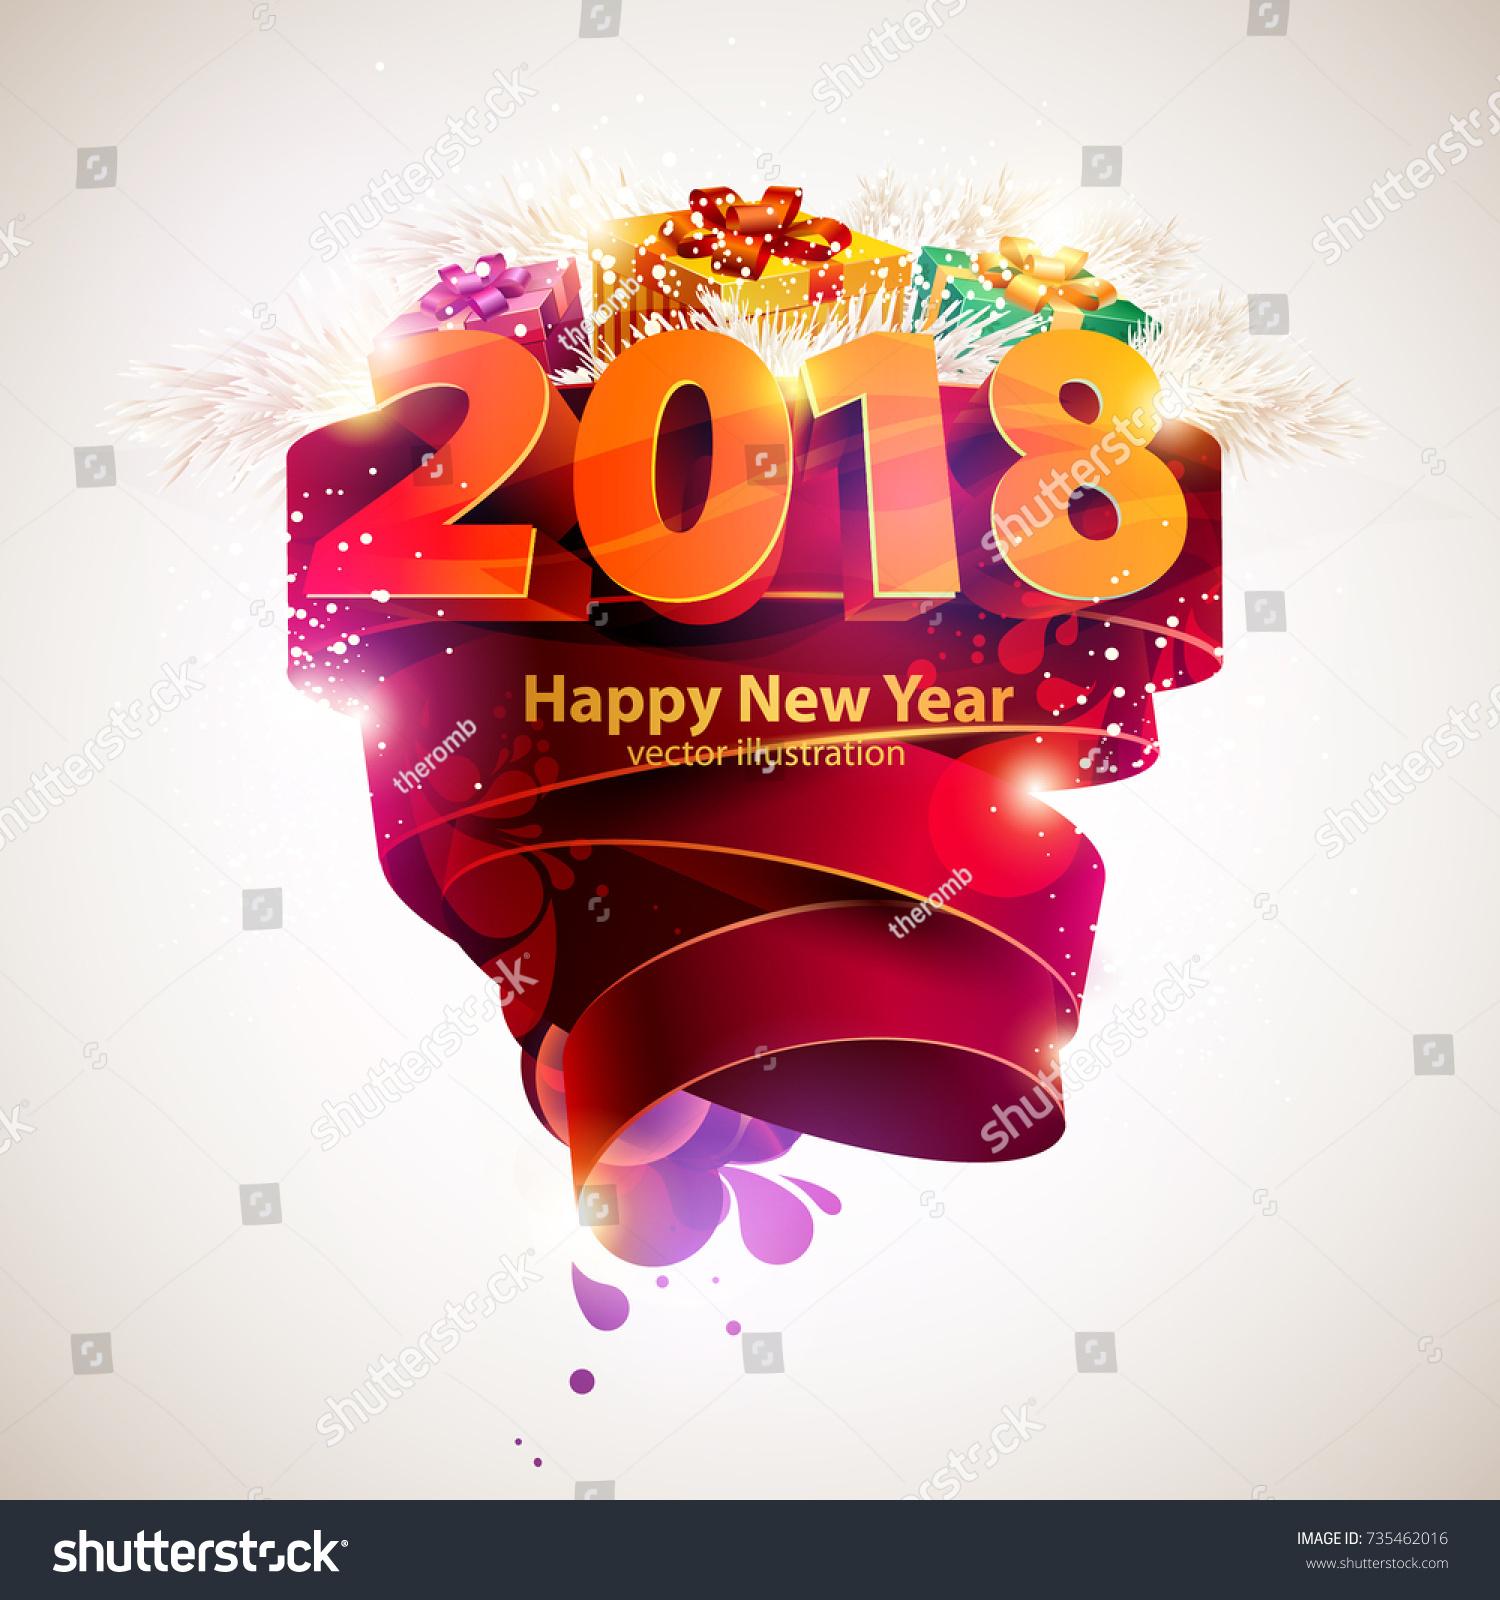 New Year Poster Template   Happy New Year 2018 Poster Template Stock Vektorgrafik Lizenzfrei